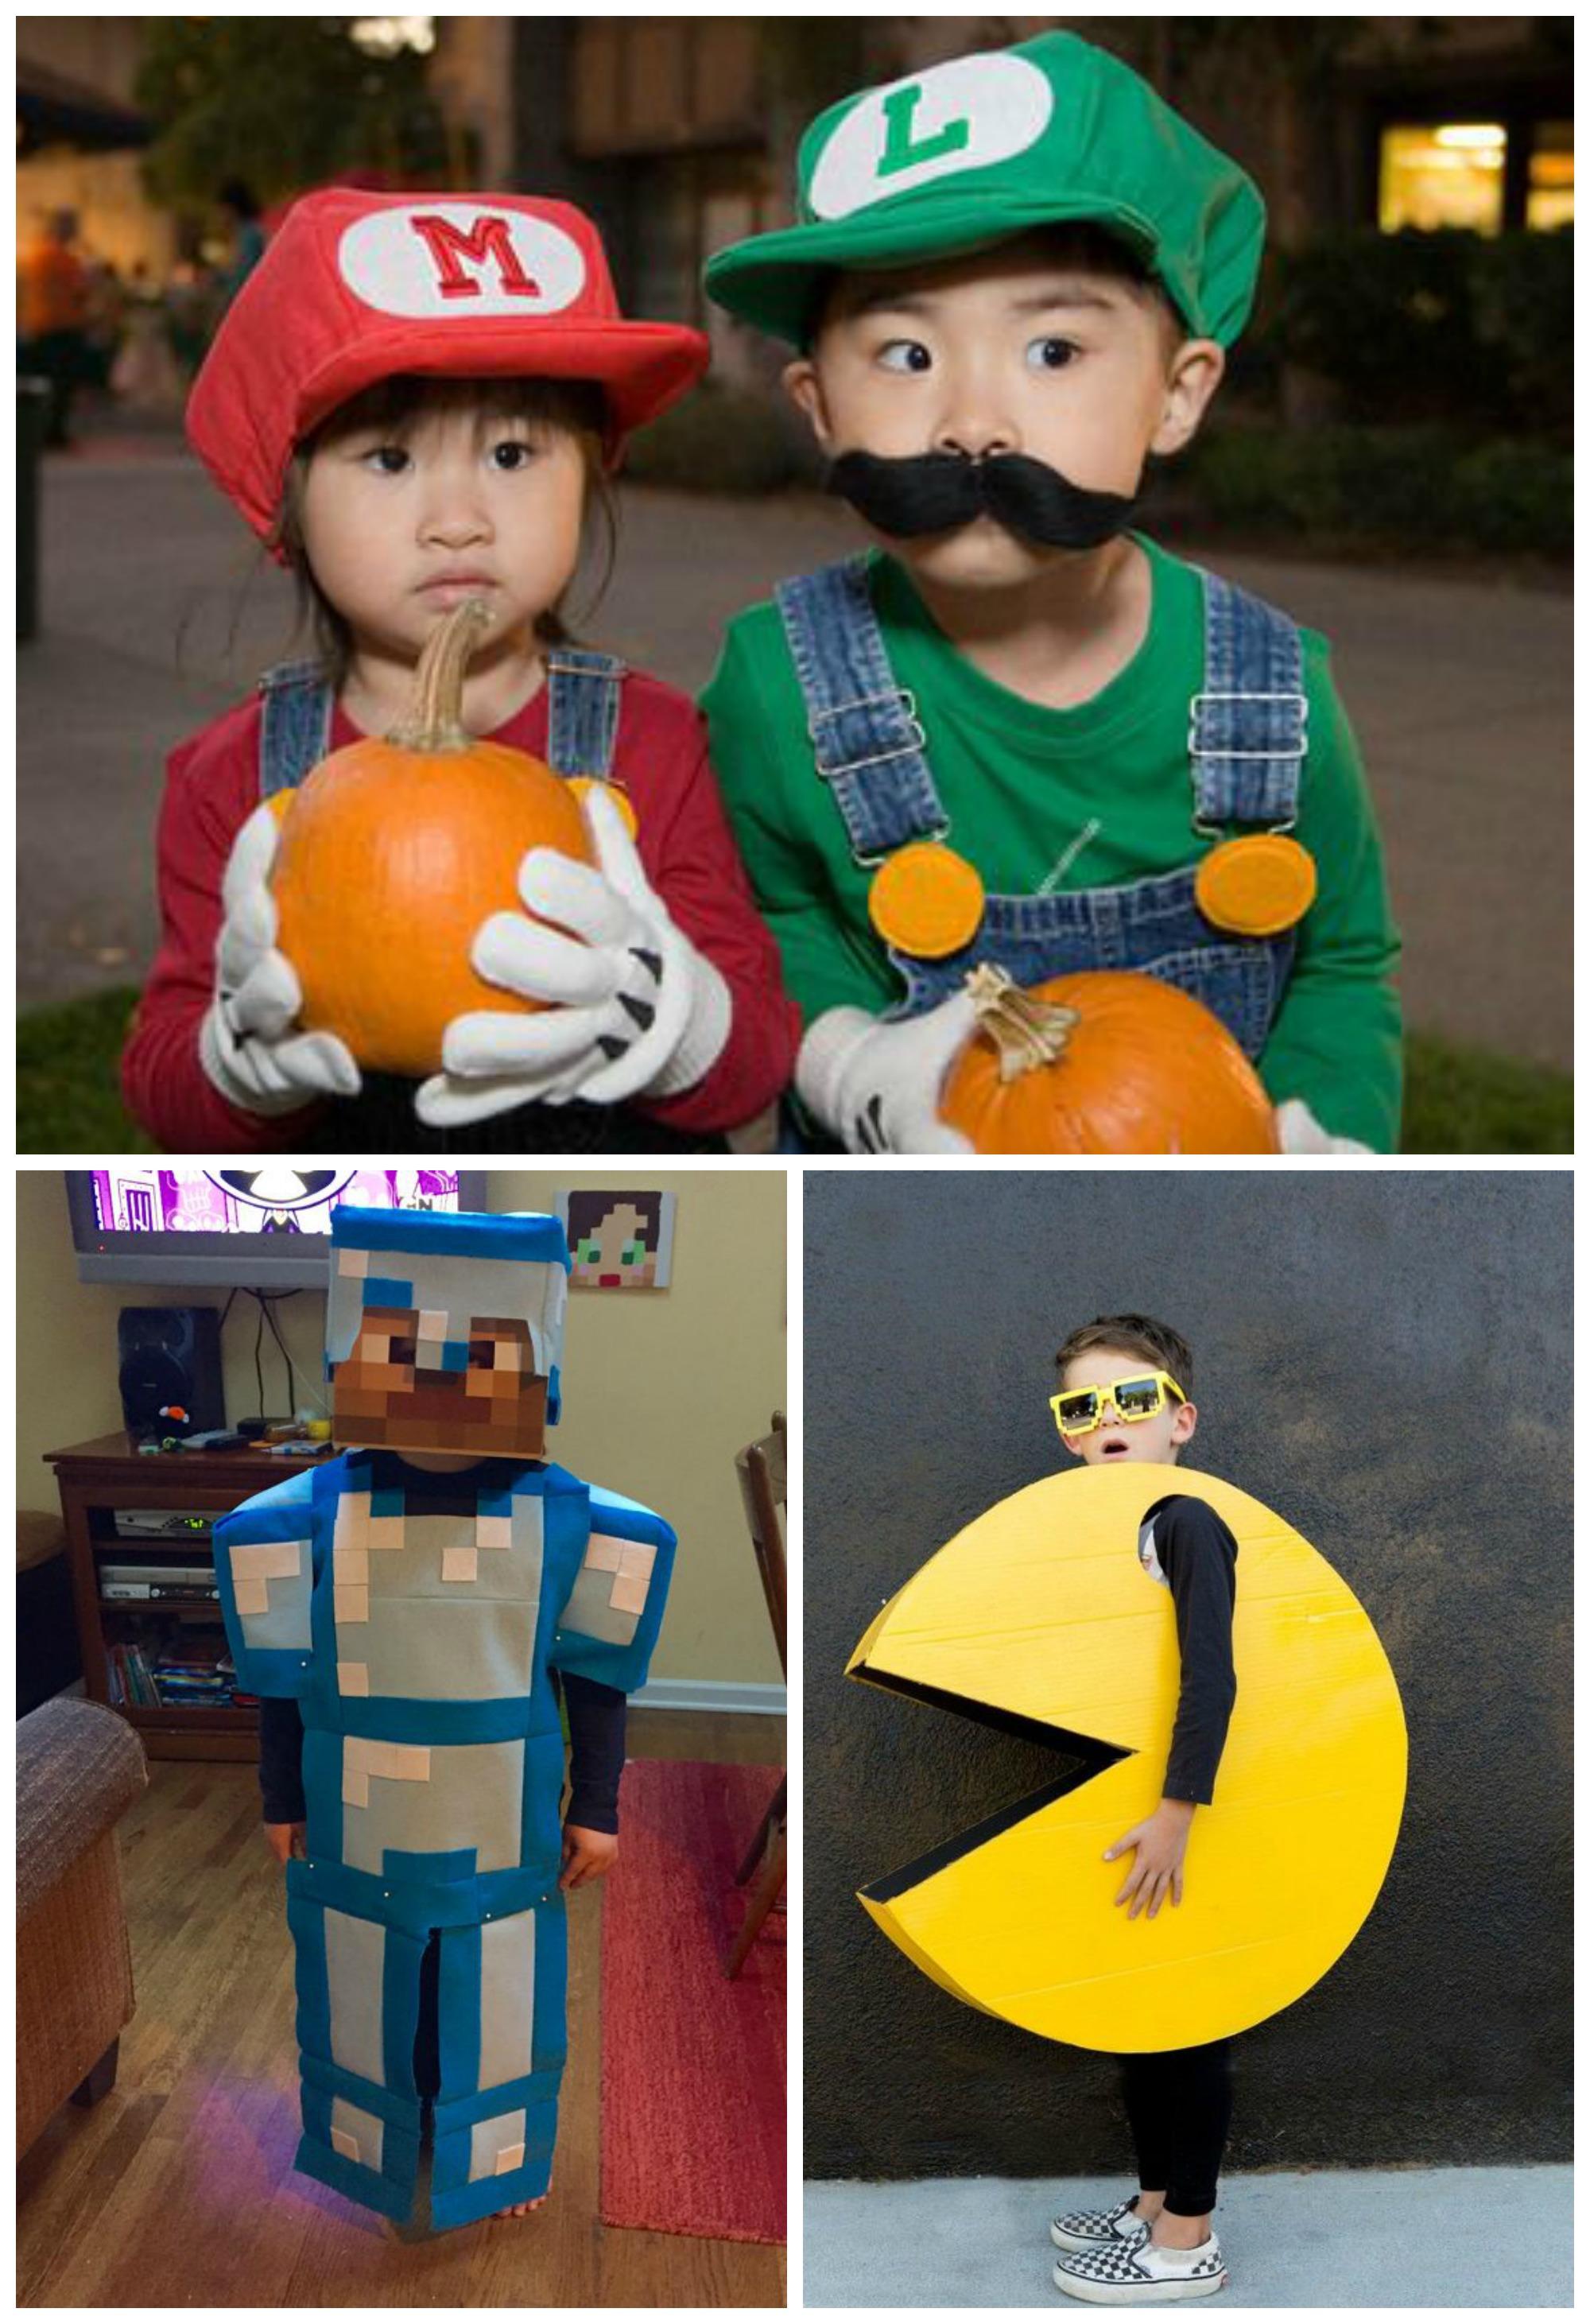 Personagens de videogame em fantasias de carnaval infantil